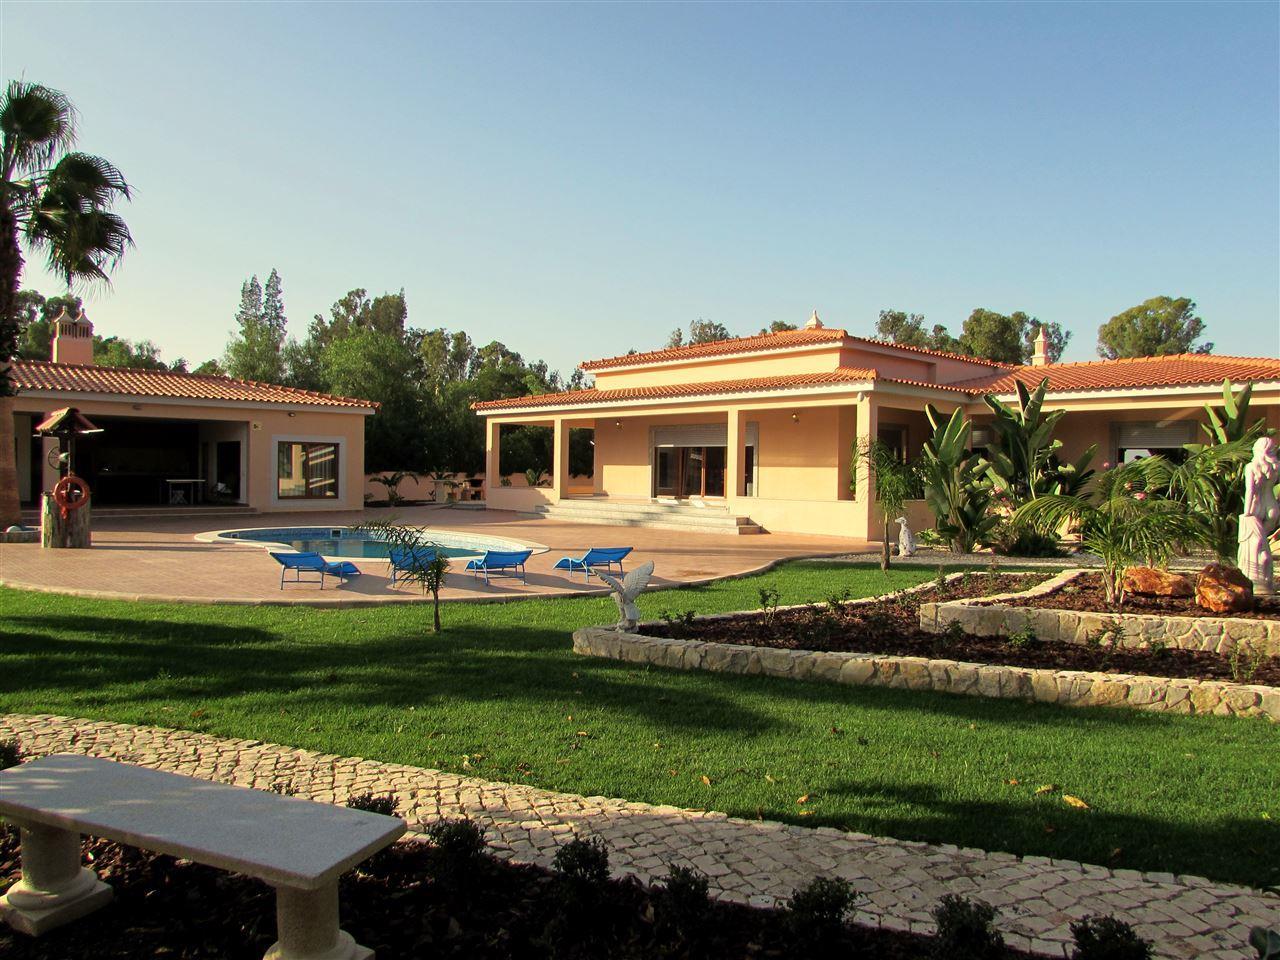 Moradia para Venda às Detached house, 3 bedrooms, for Sale Portimao, Algarve, Portugal